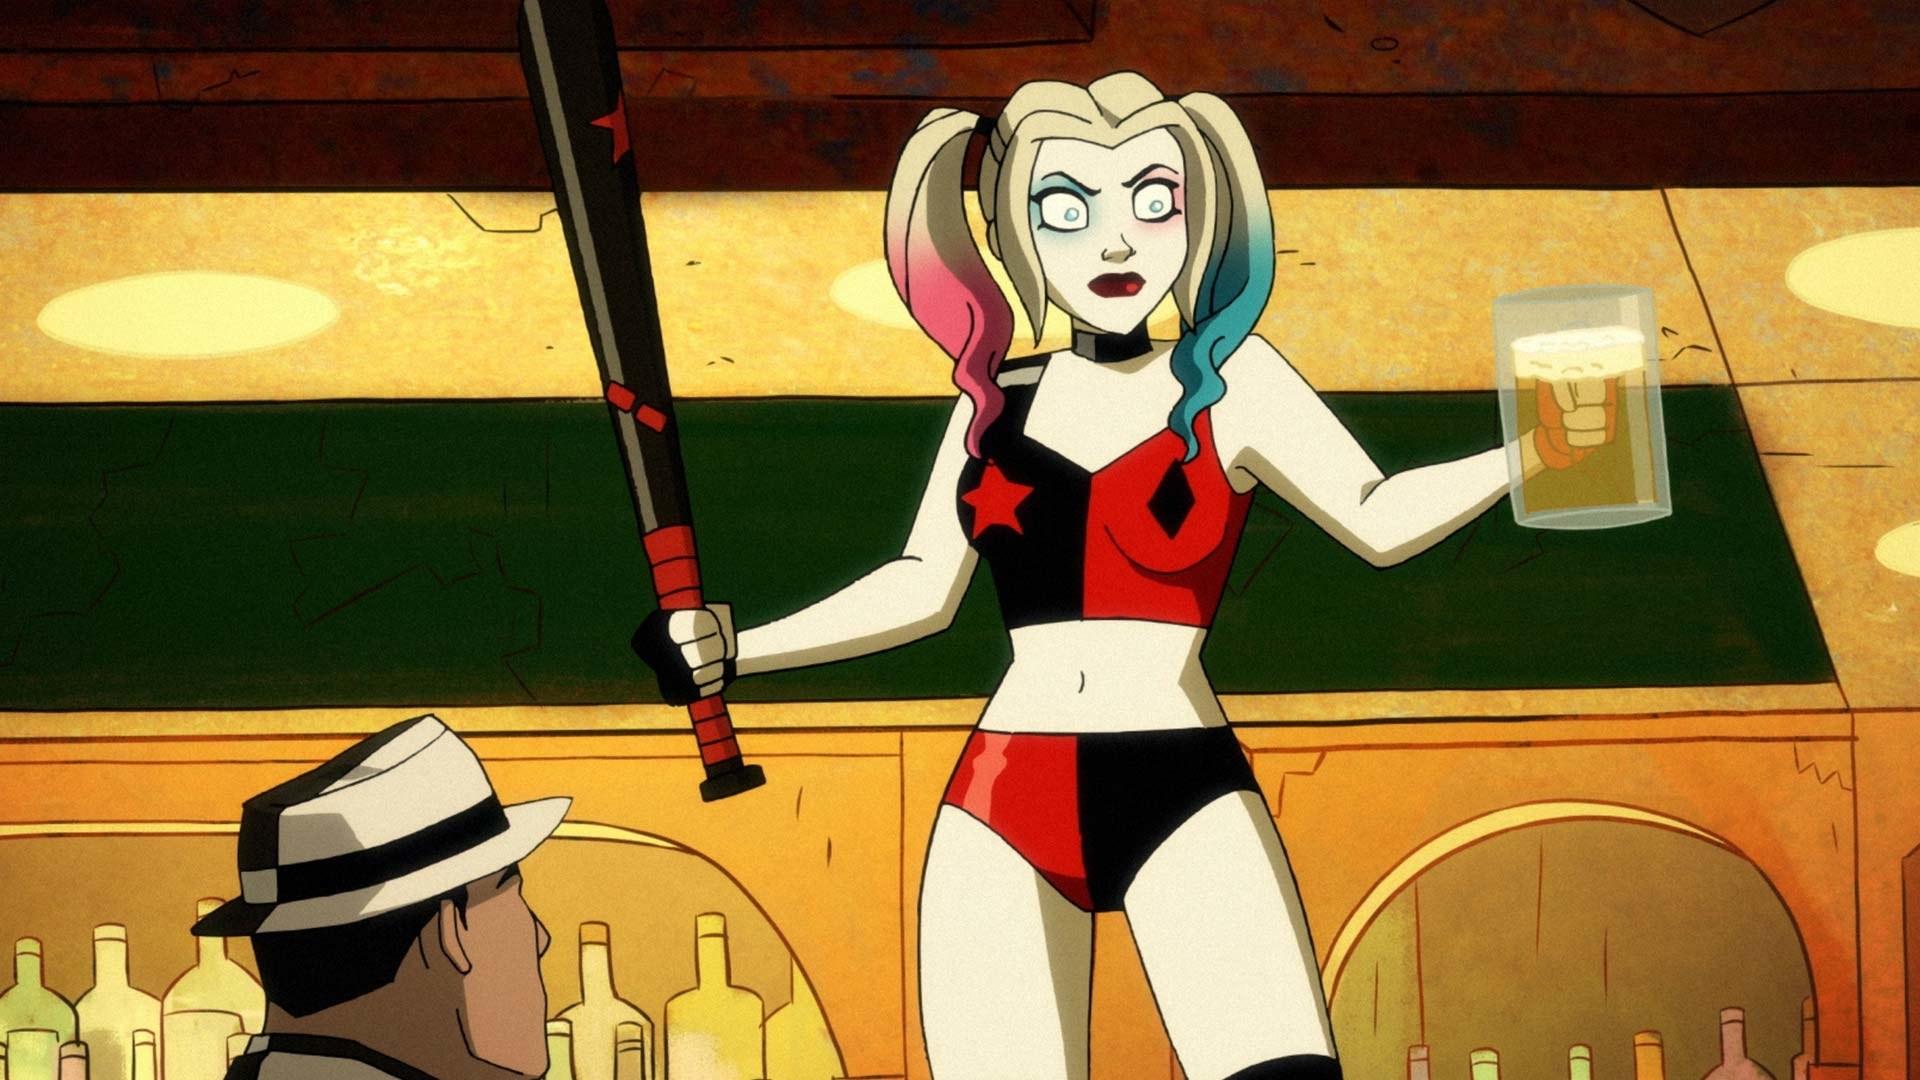 Animated Harley Quinn holding a beer and a baseball bat